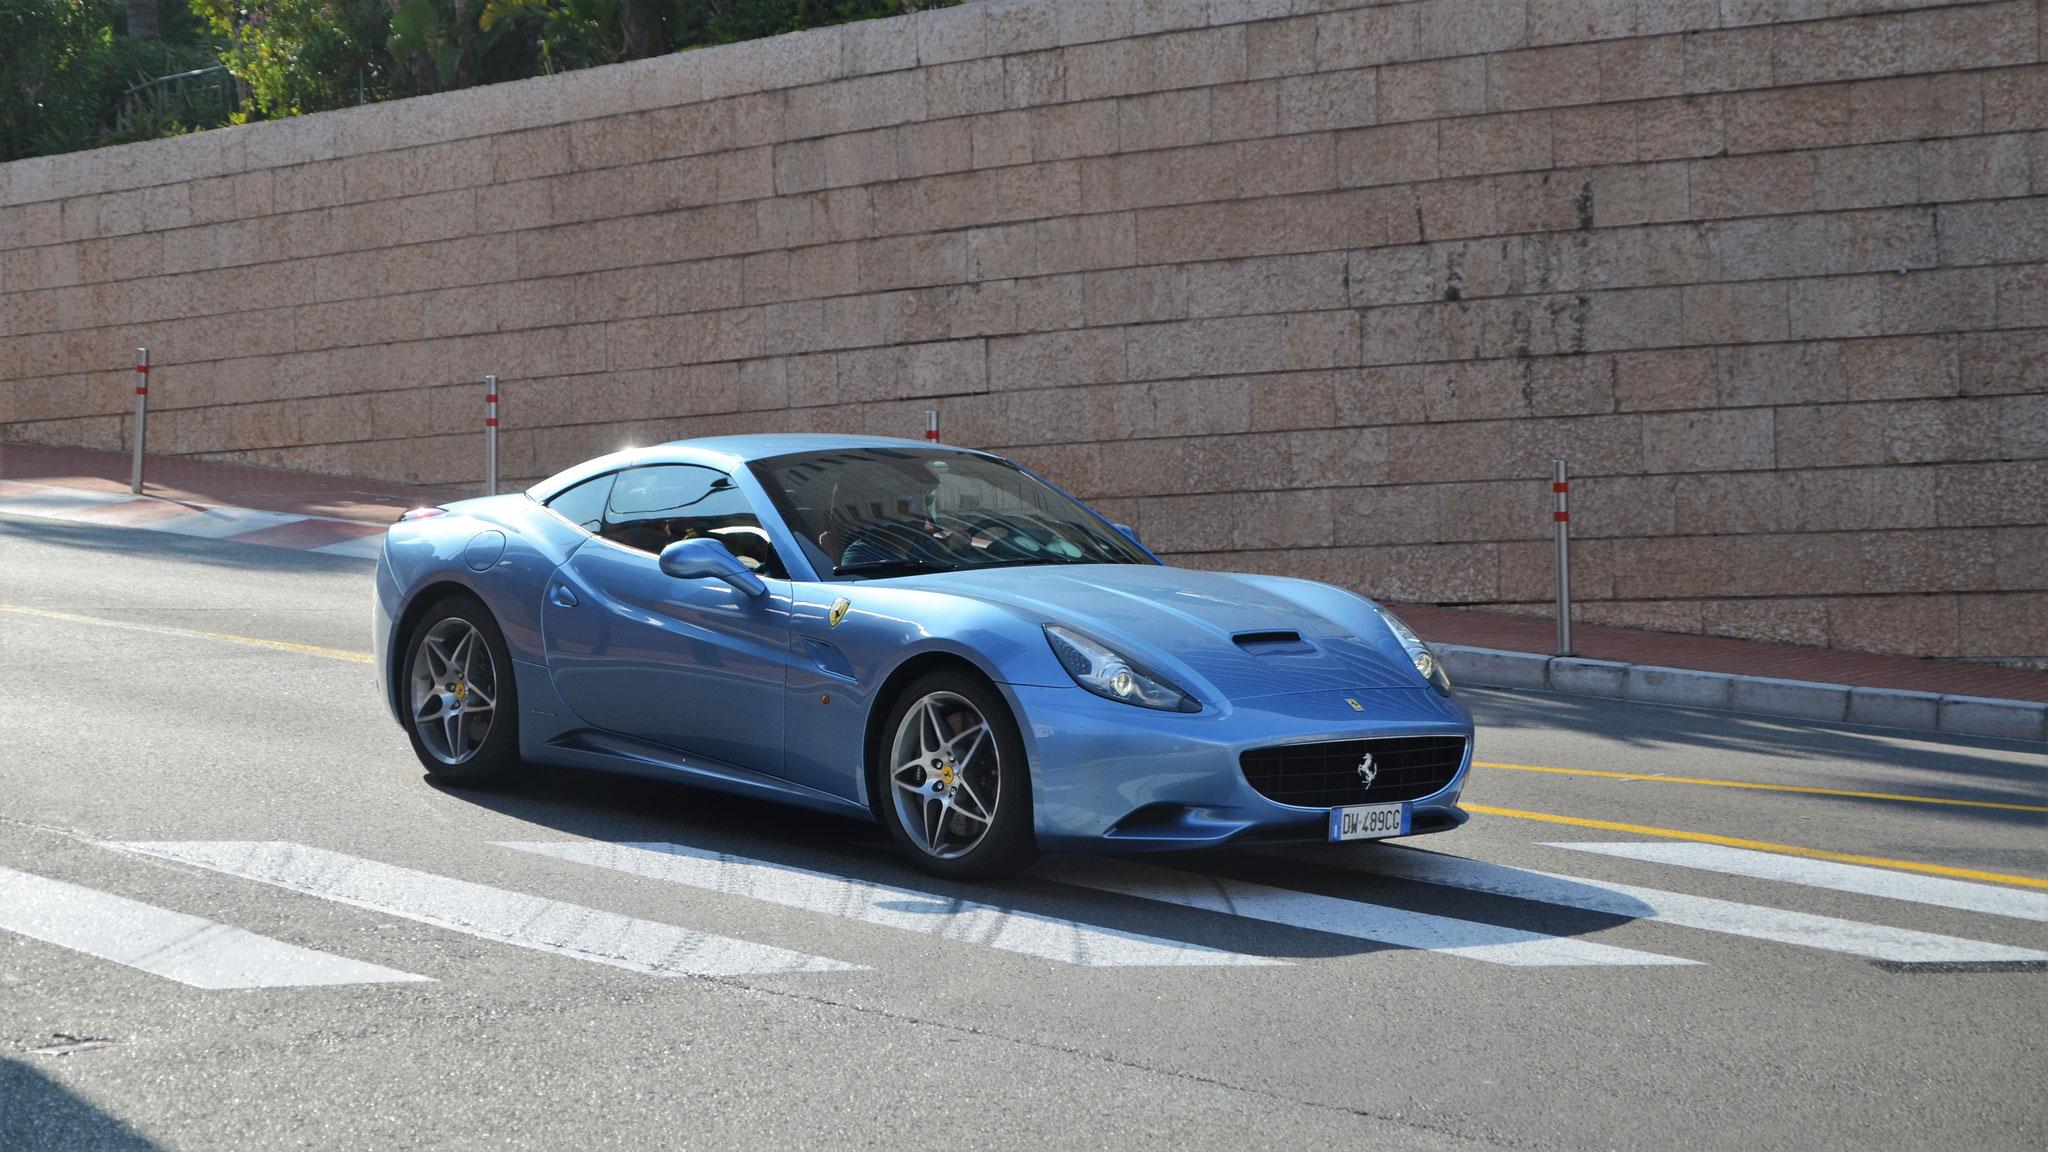 Ferrari California - DW-489-CG (ITA)